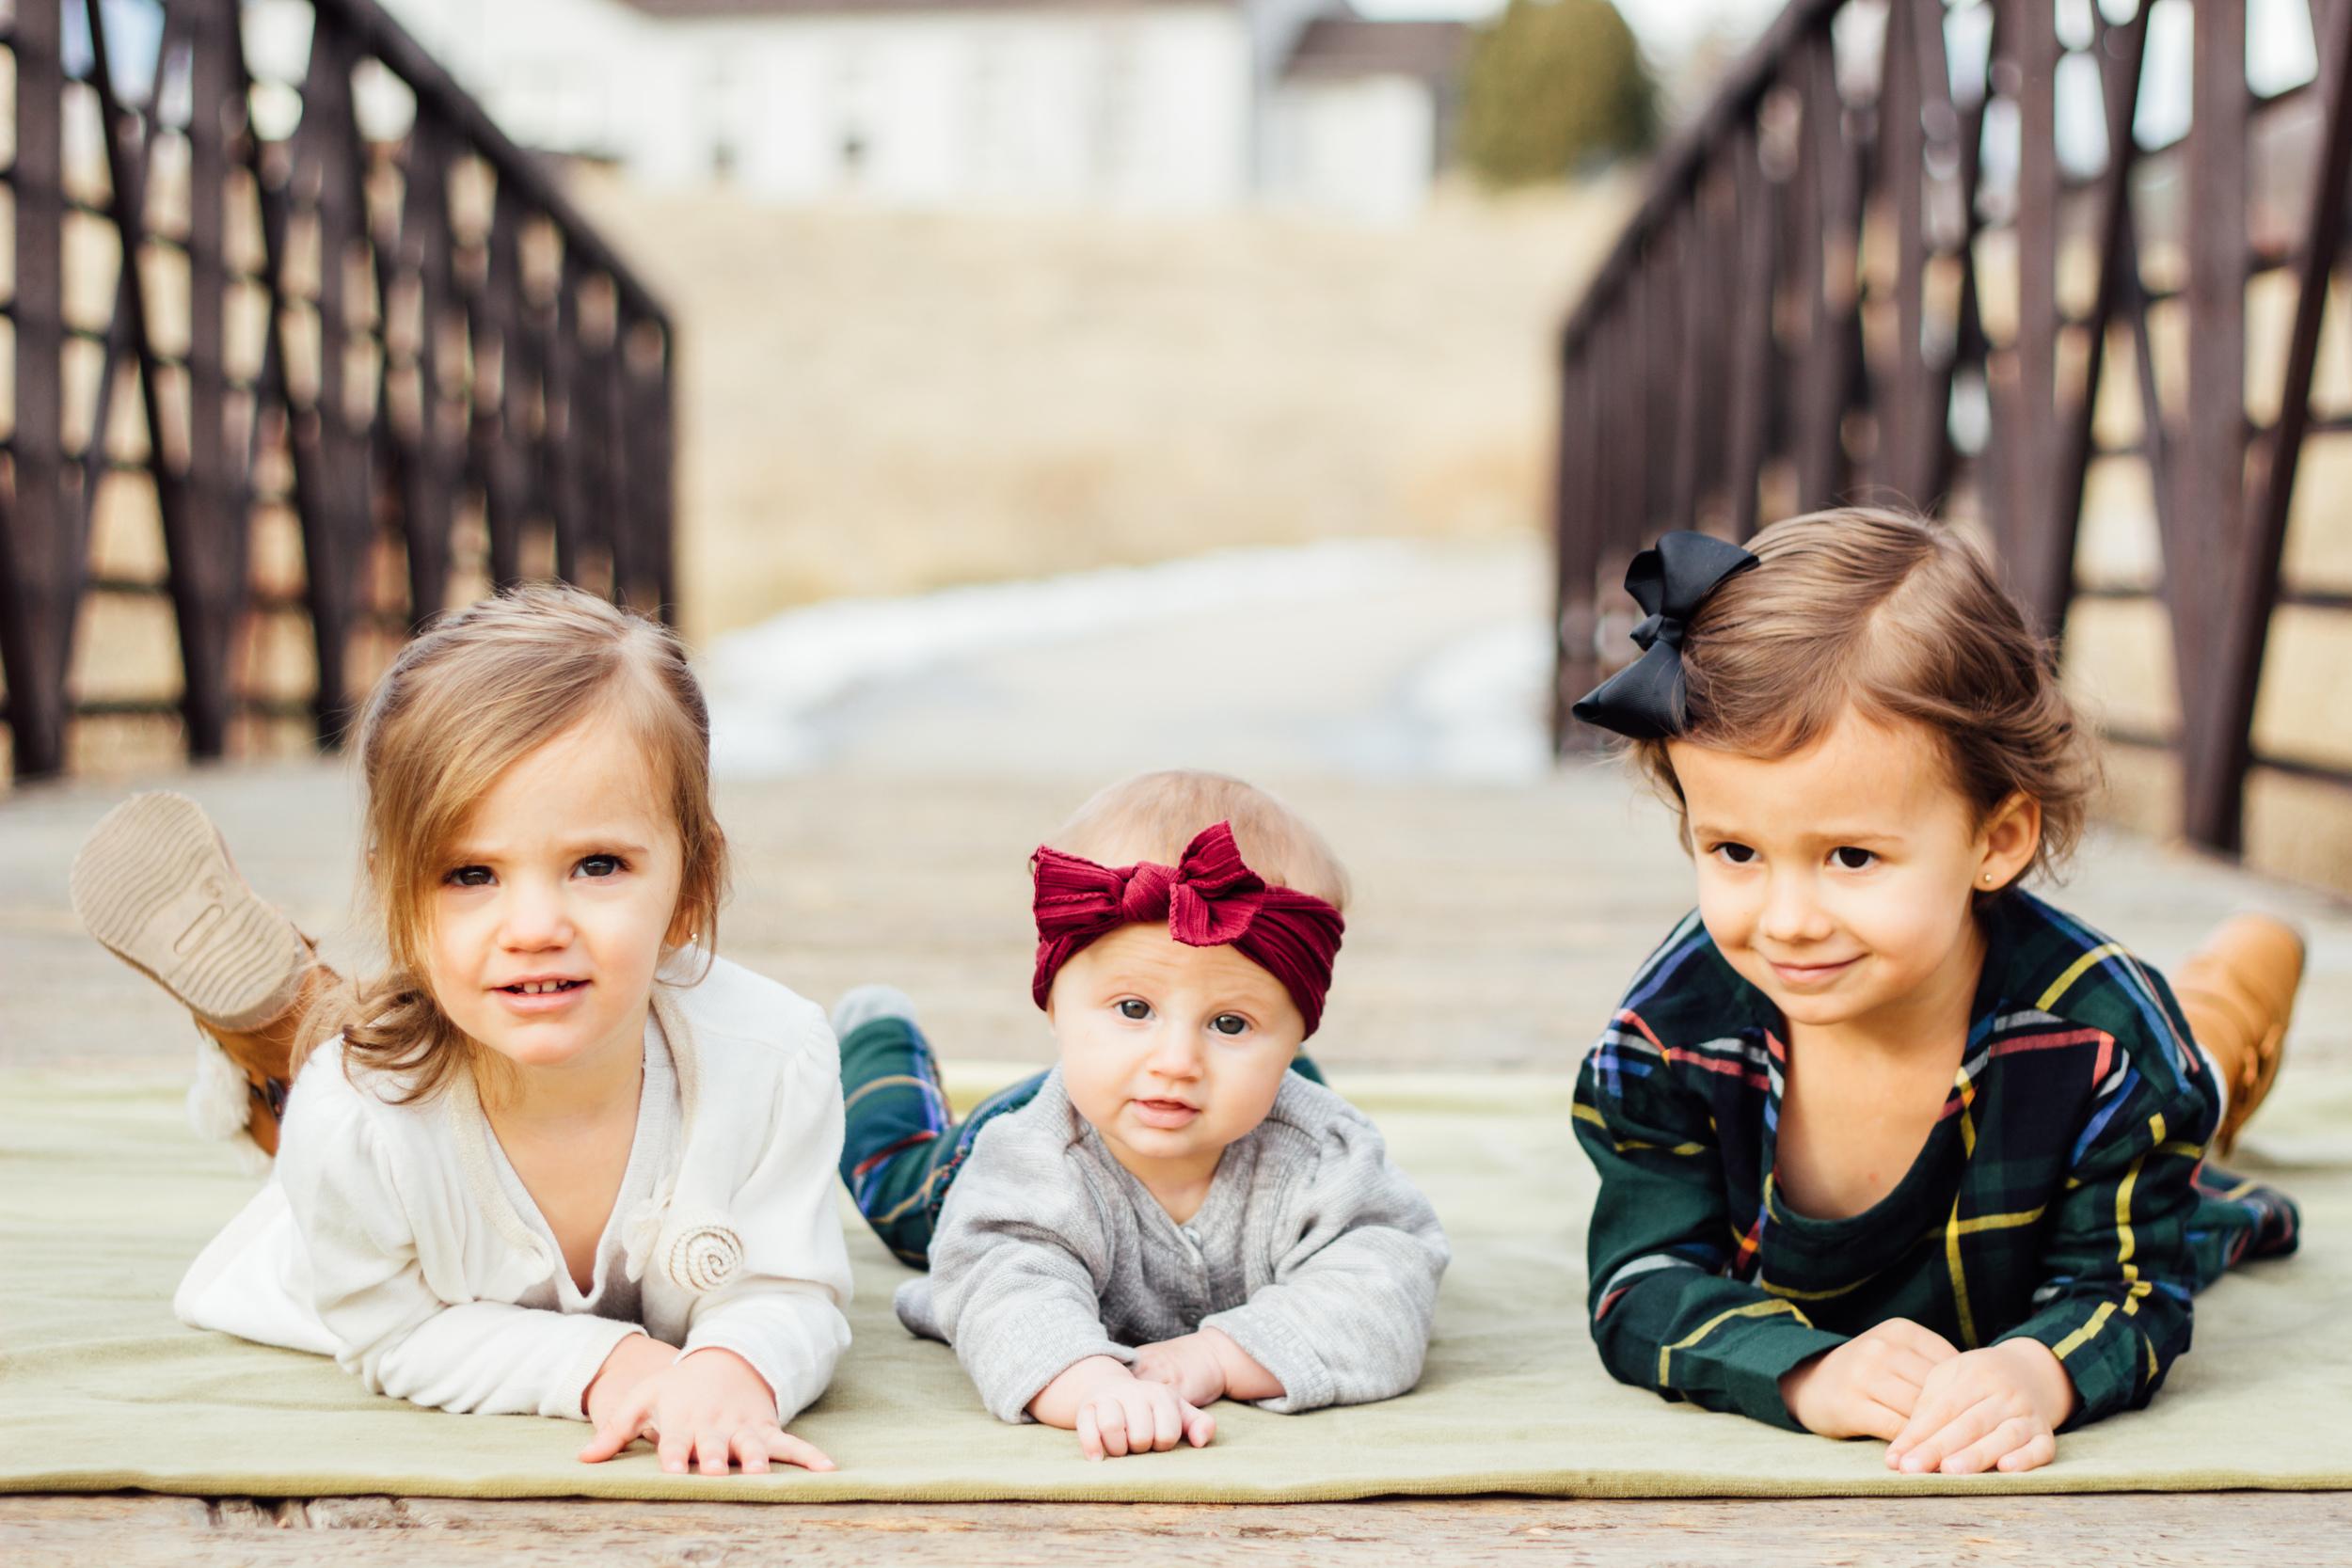 Colorado Family Photos at Belmar Park in Lakewood, Co